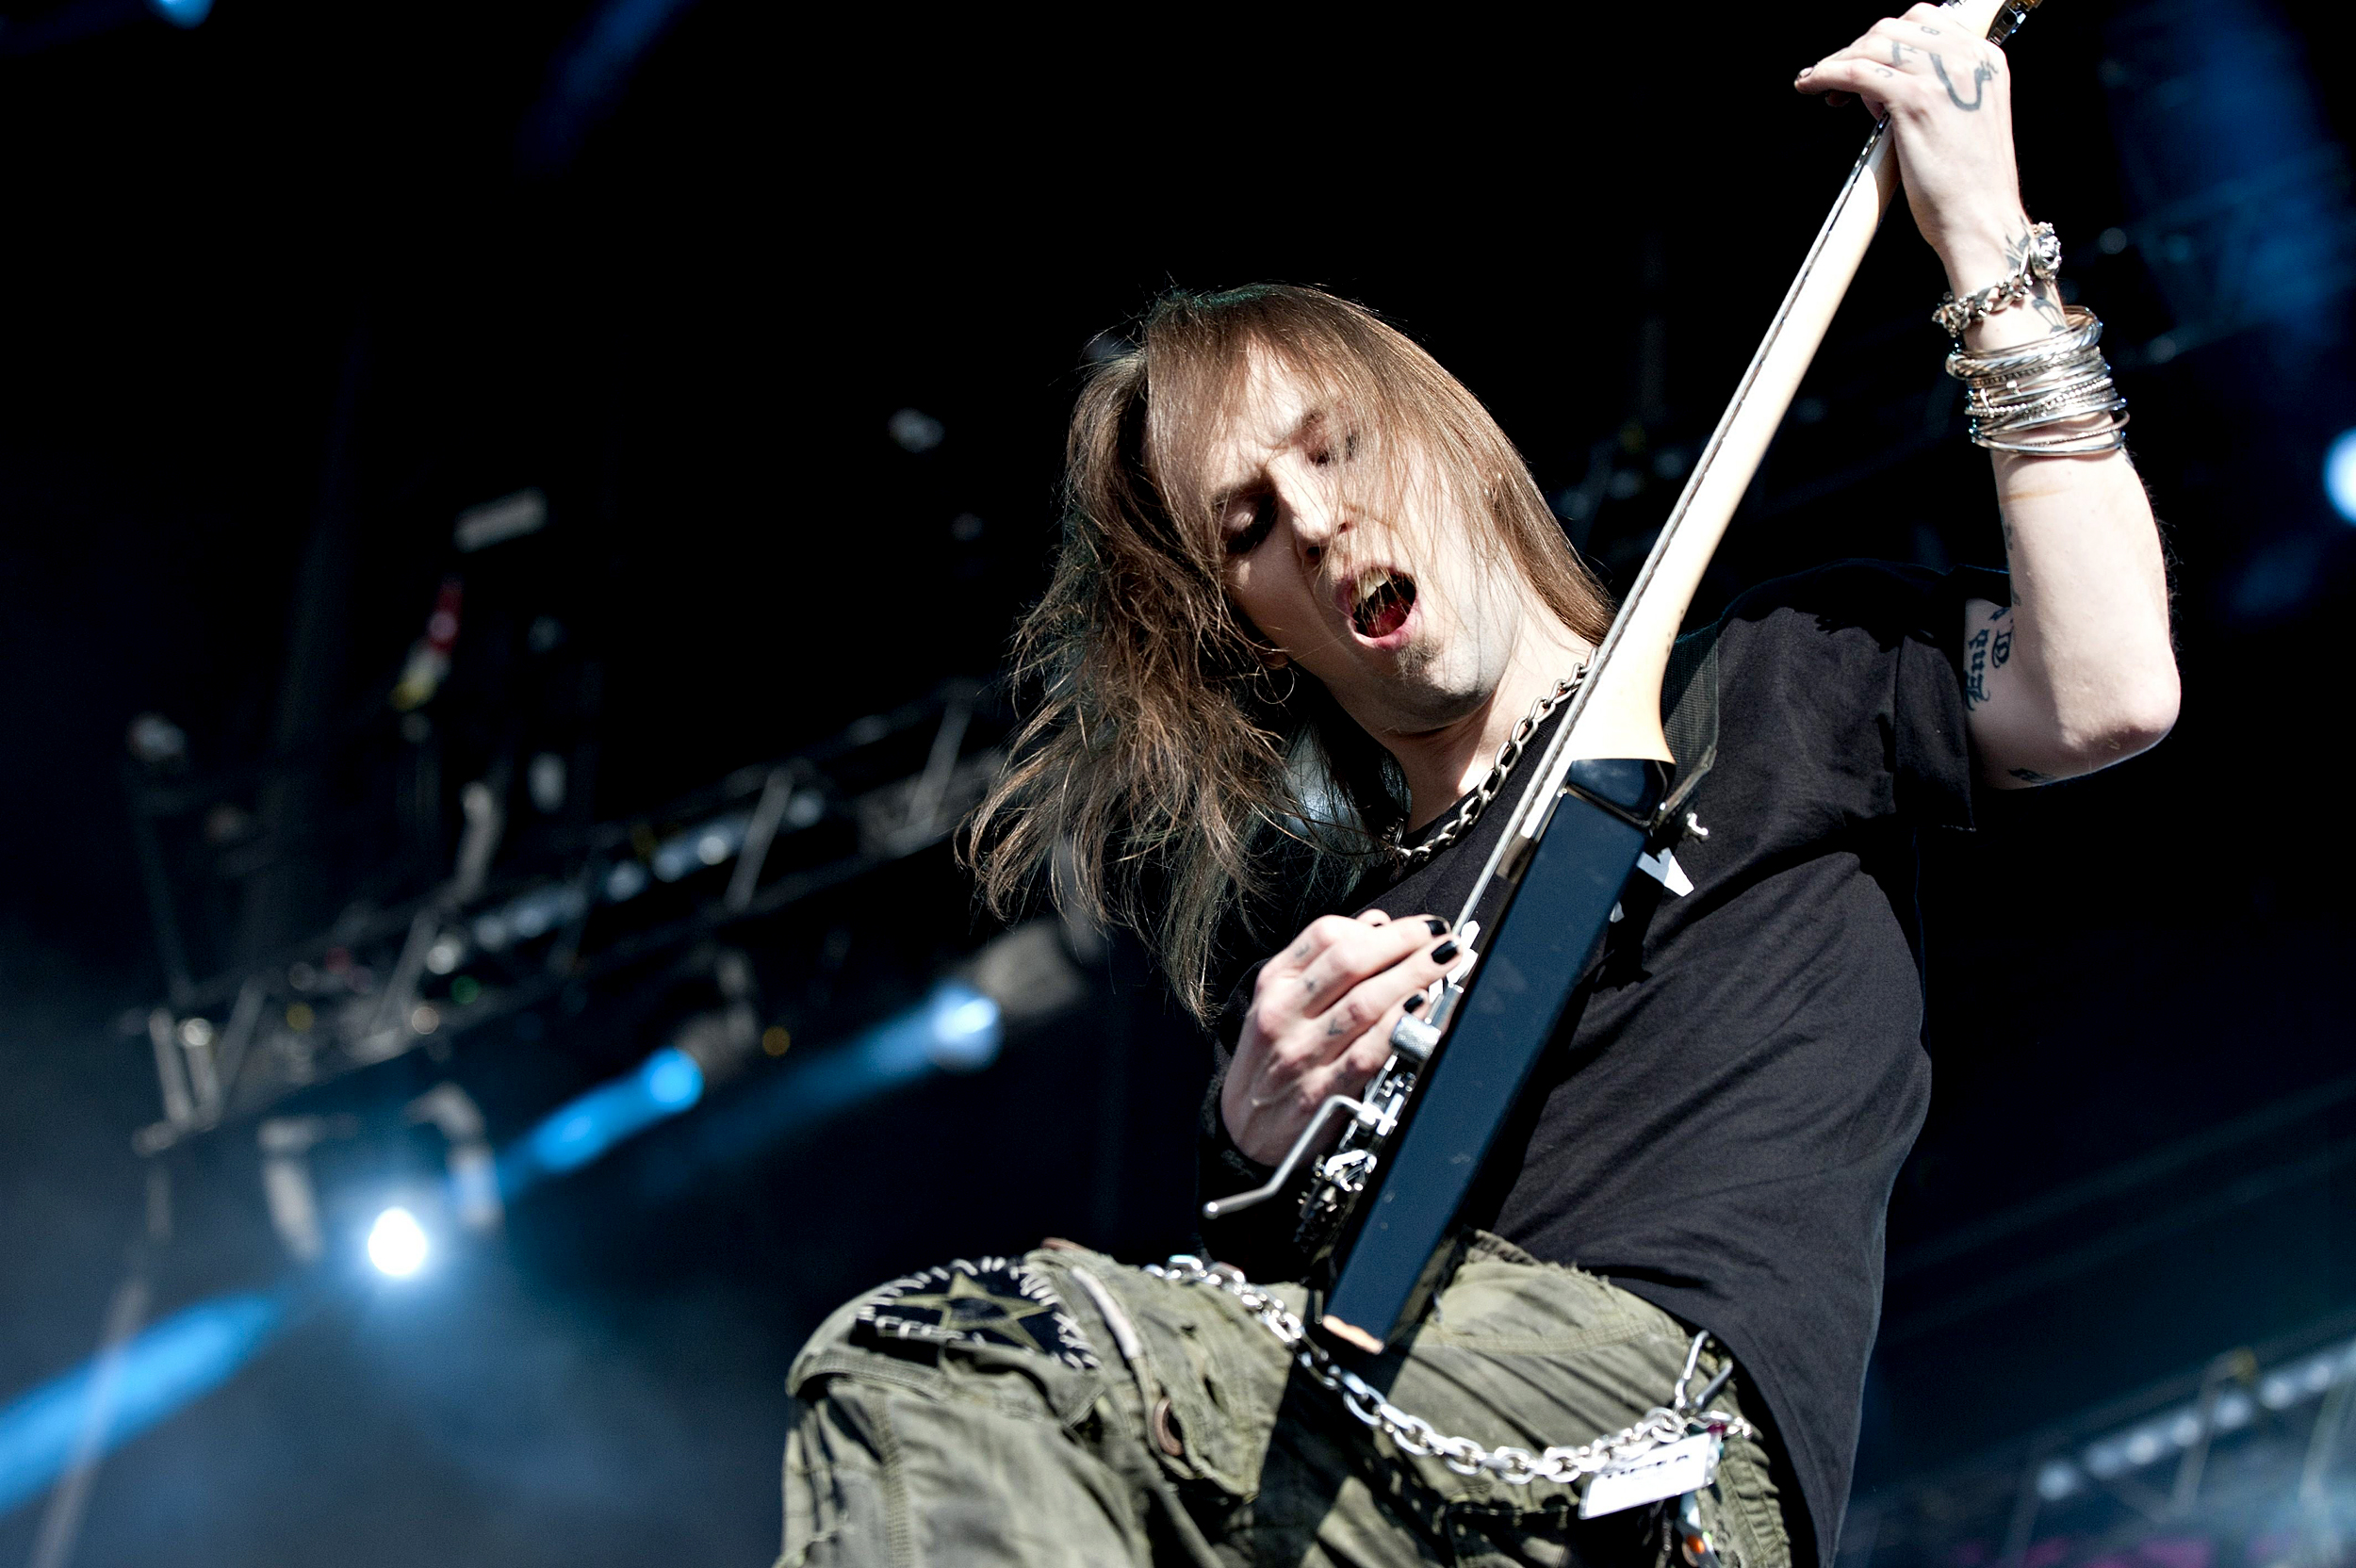 Alexi Laiho, former Children of Bodom singer, dies at 41